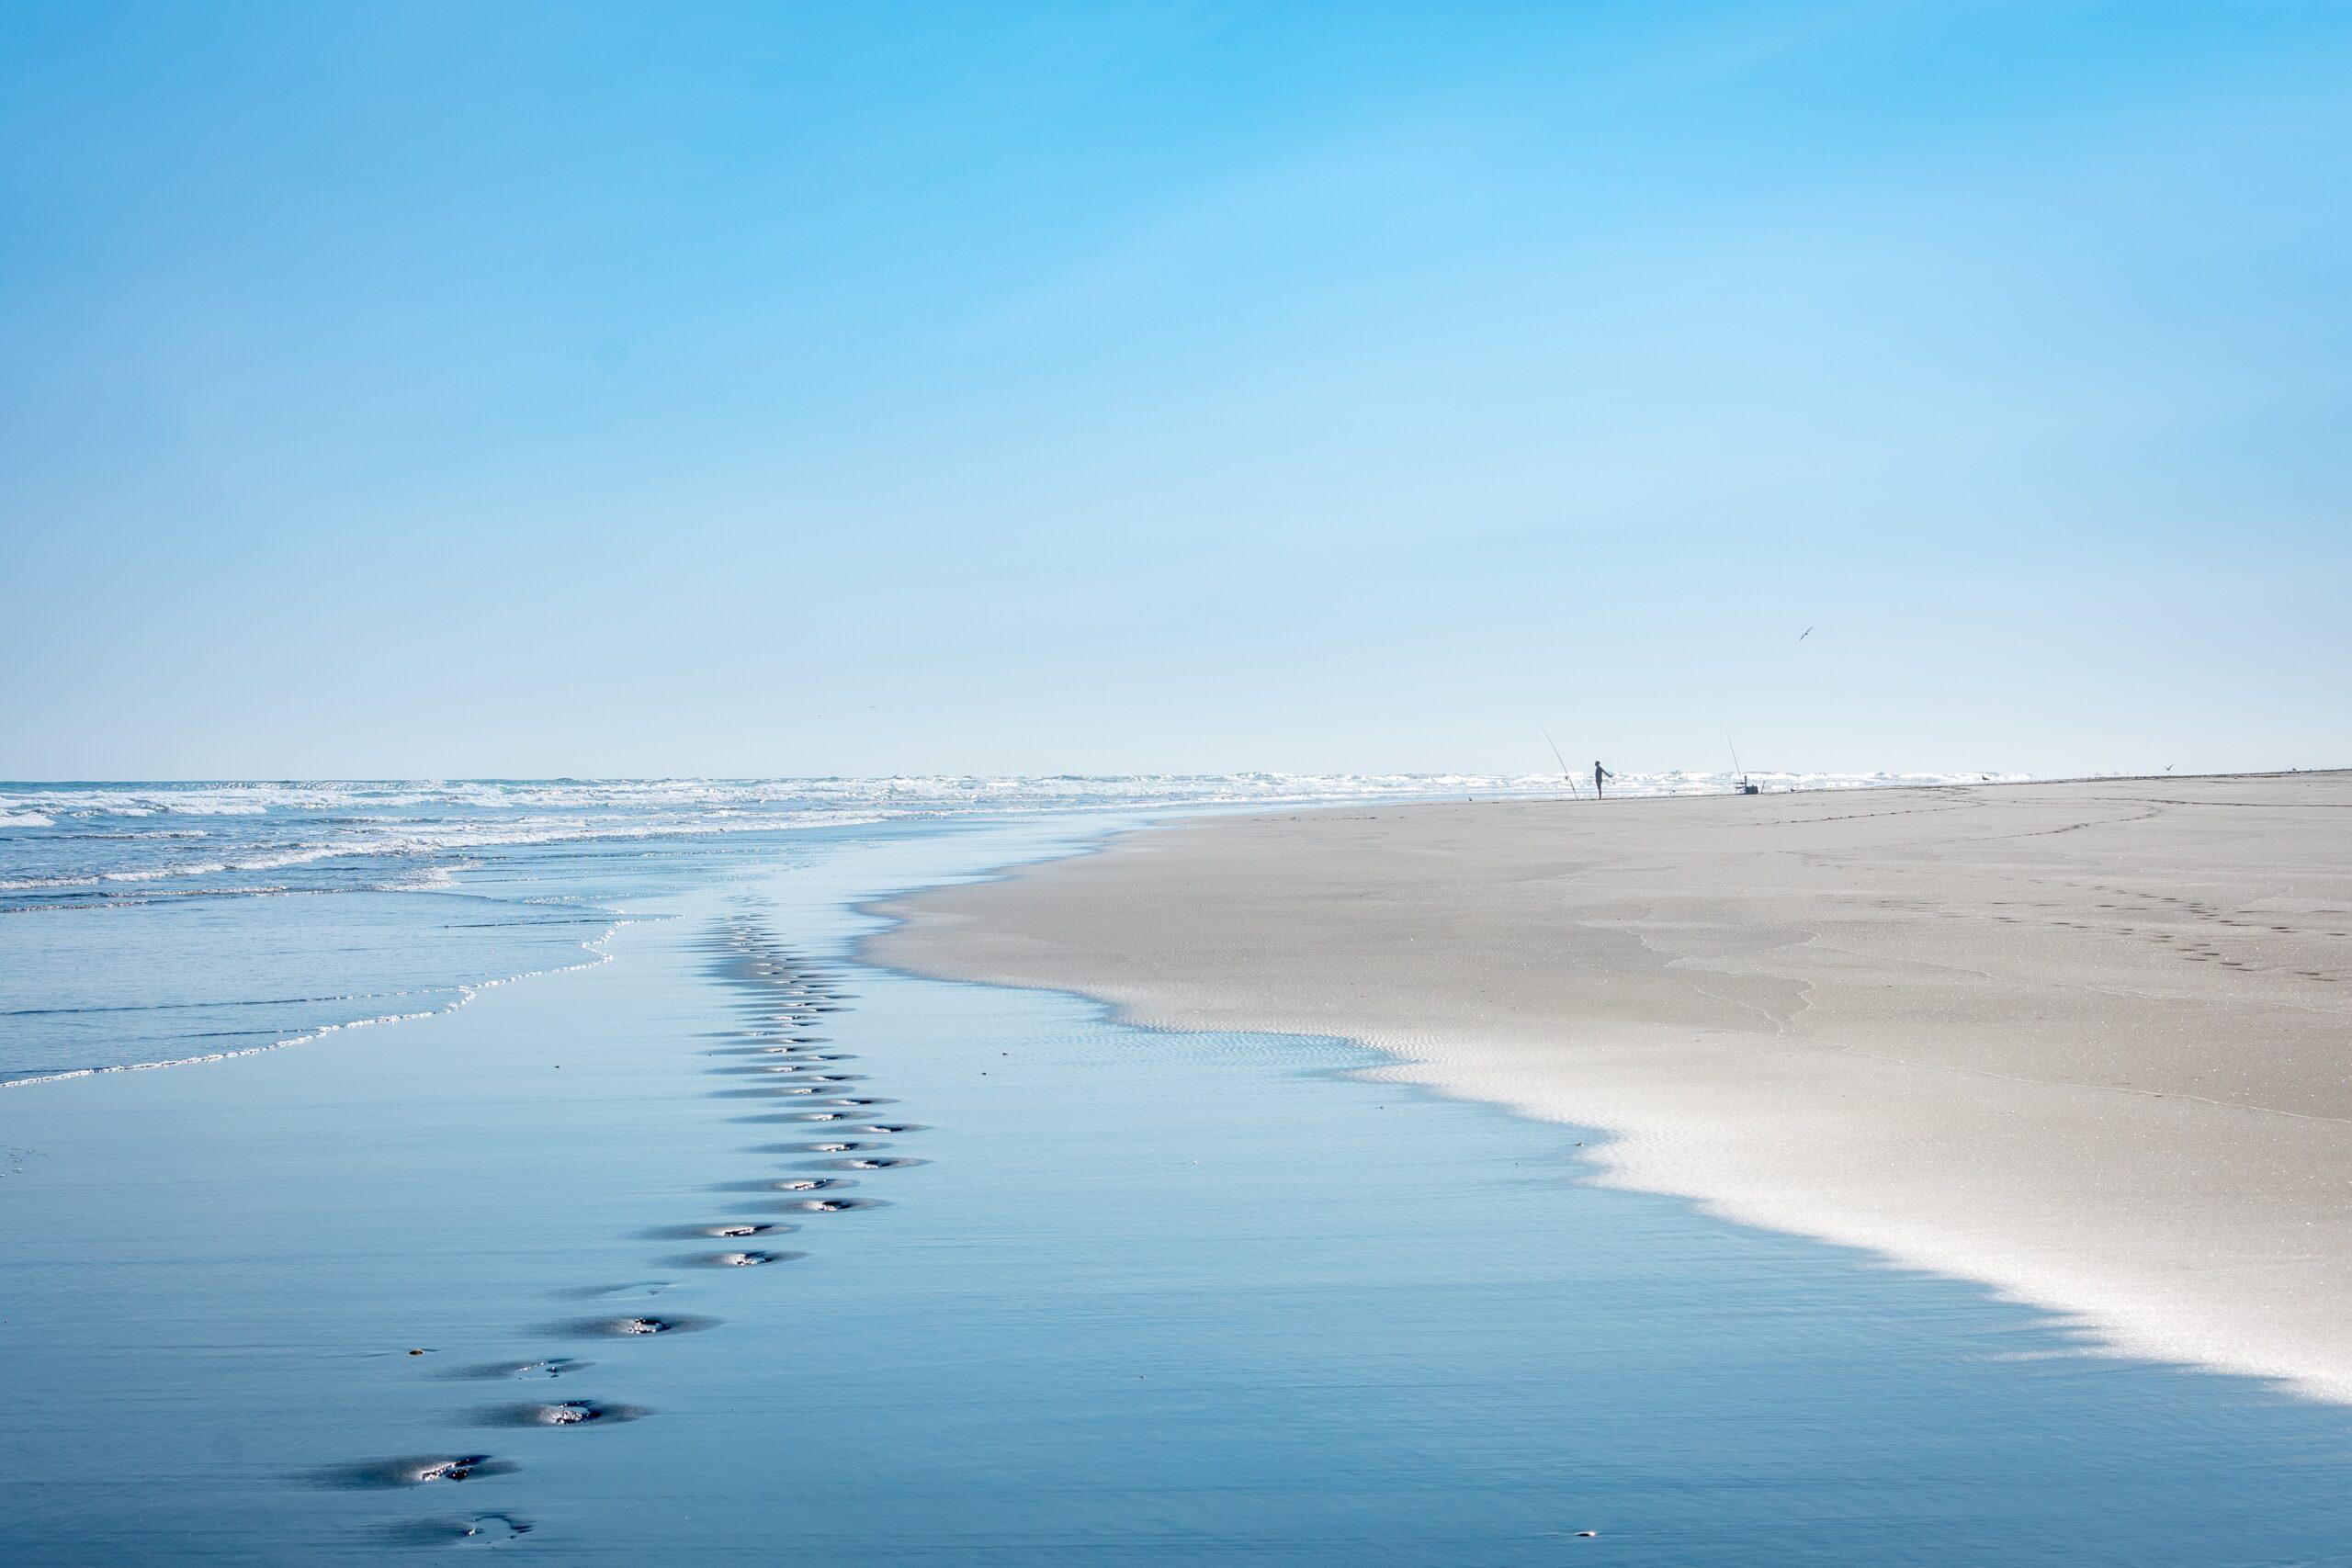 footsteps along a beach